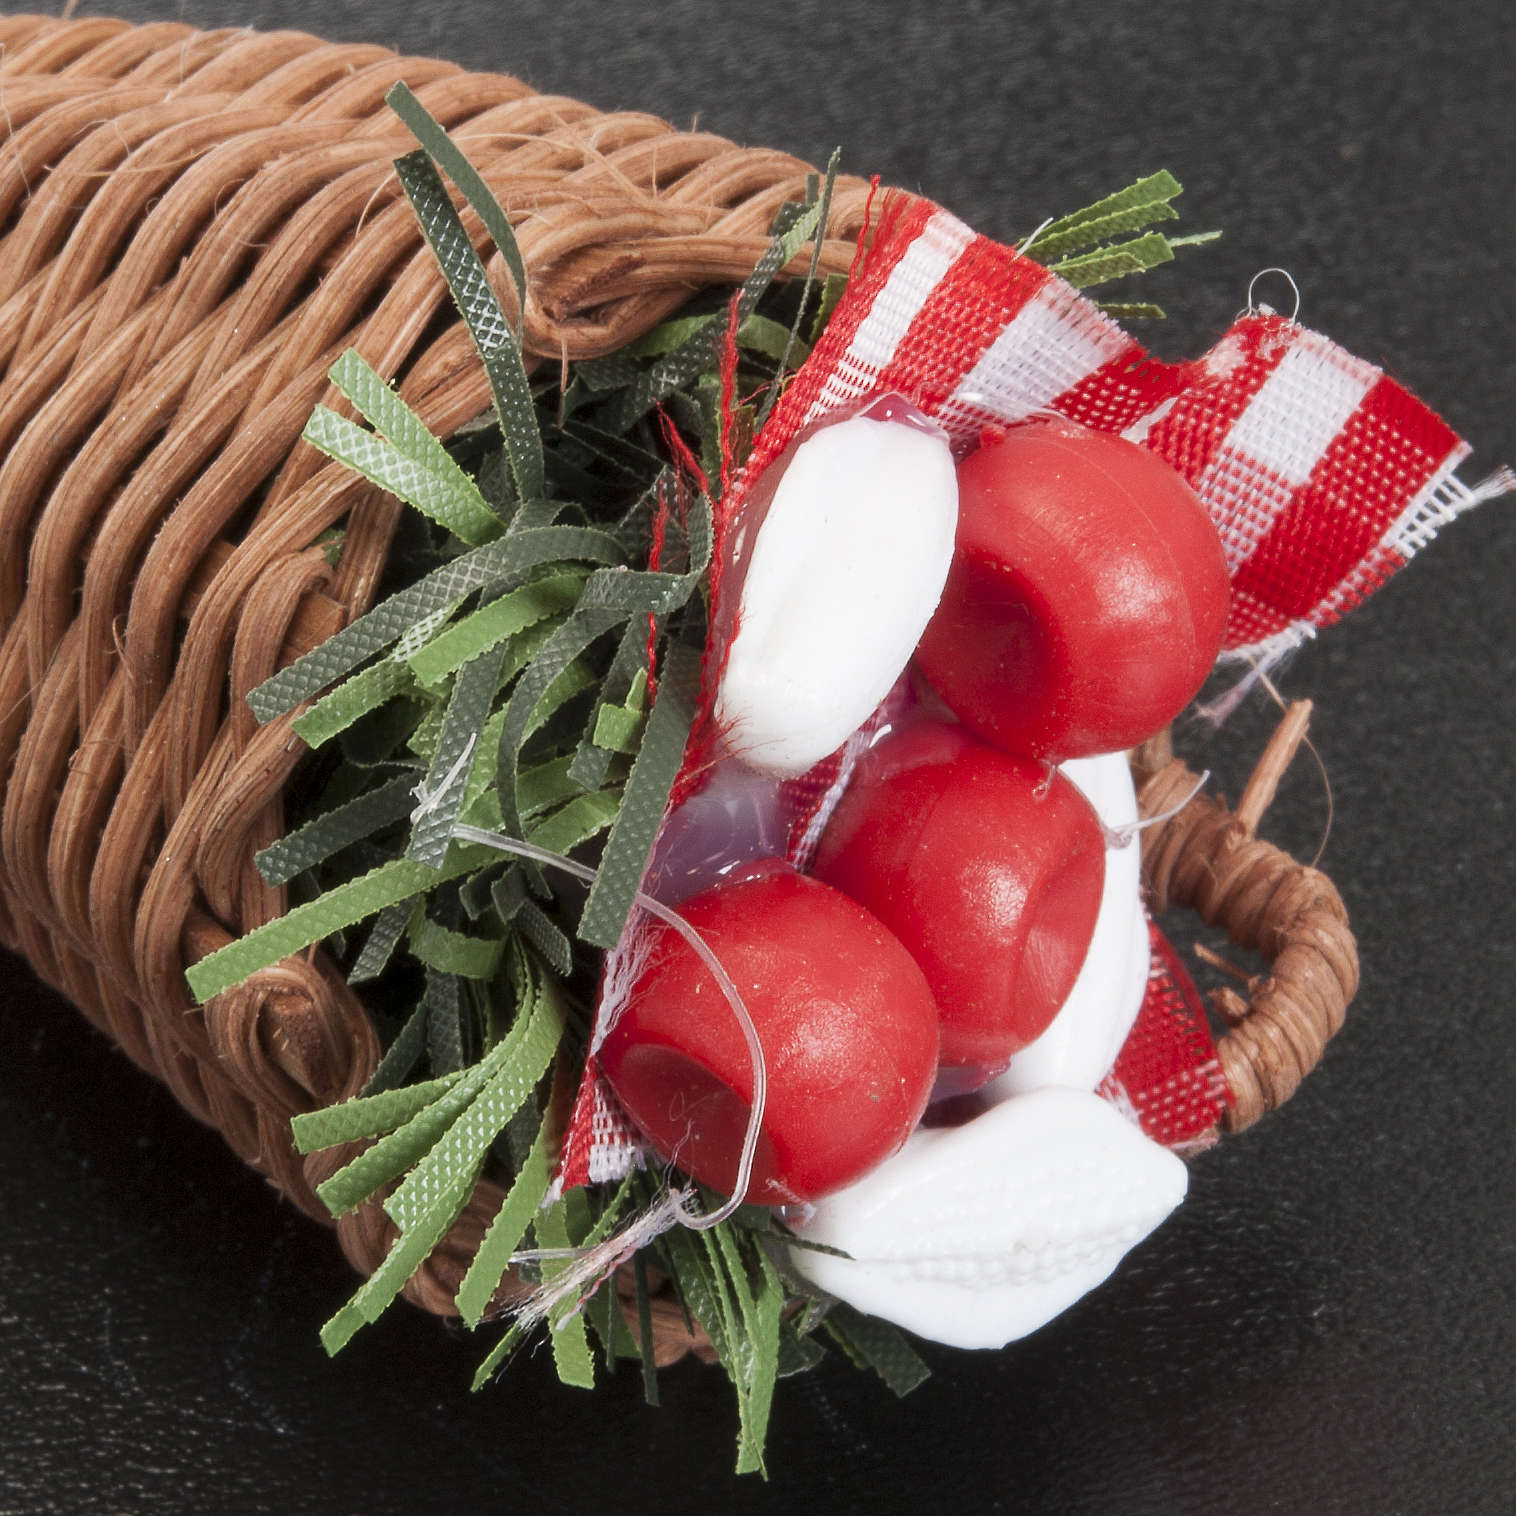 Cesto vimini presepe con verdura assortita 4